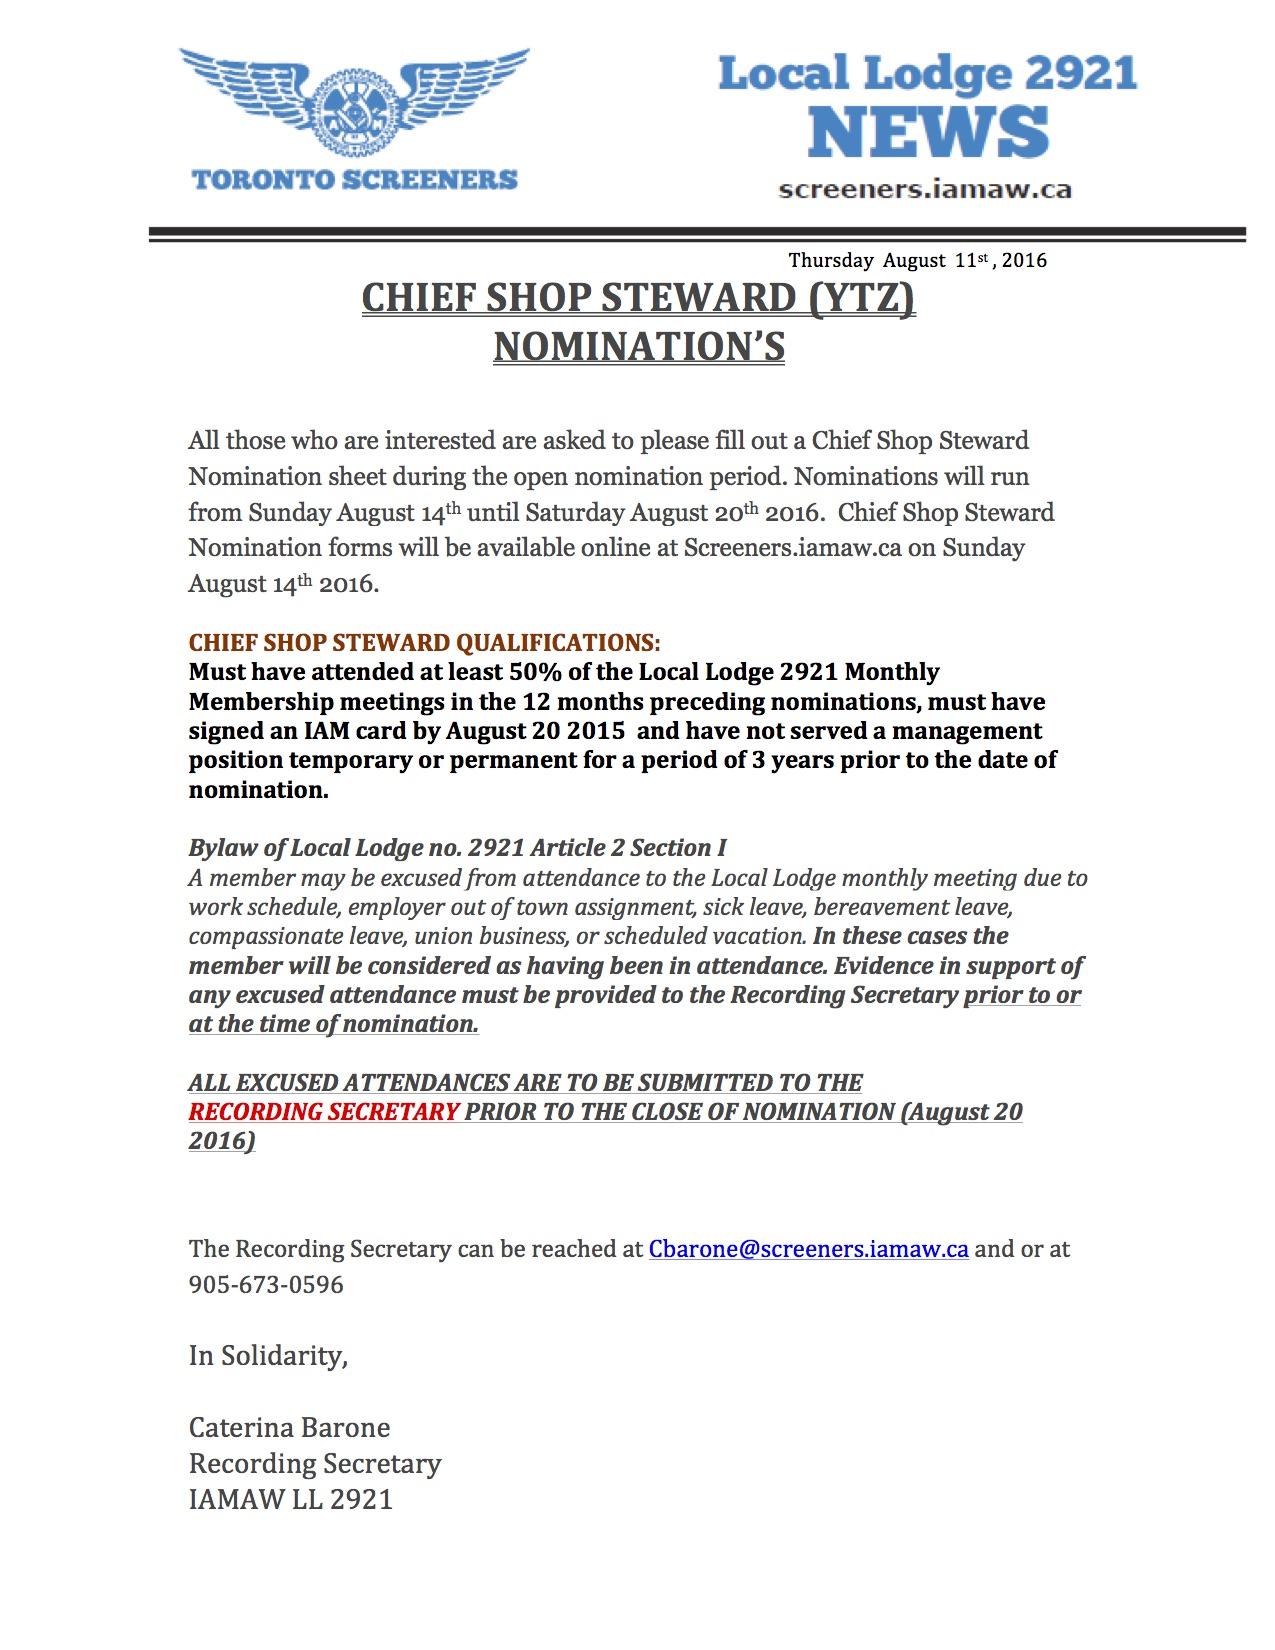 Chief Shop Steward Nominations YTZ